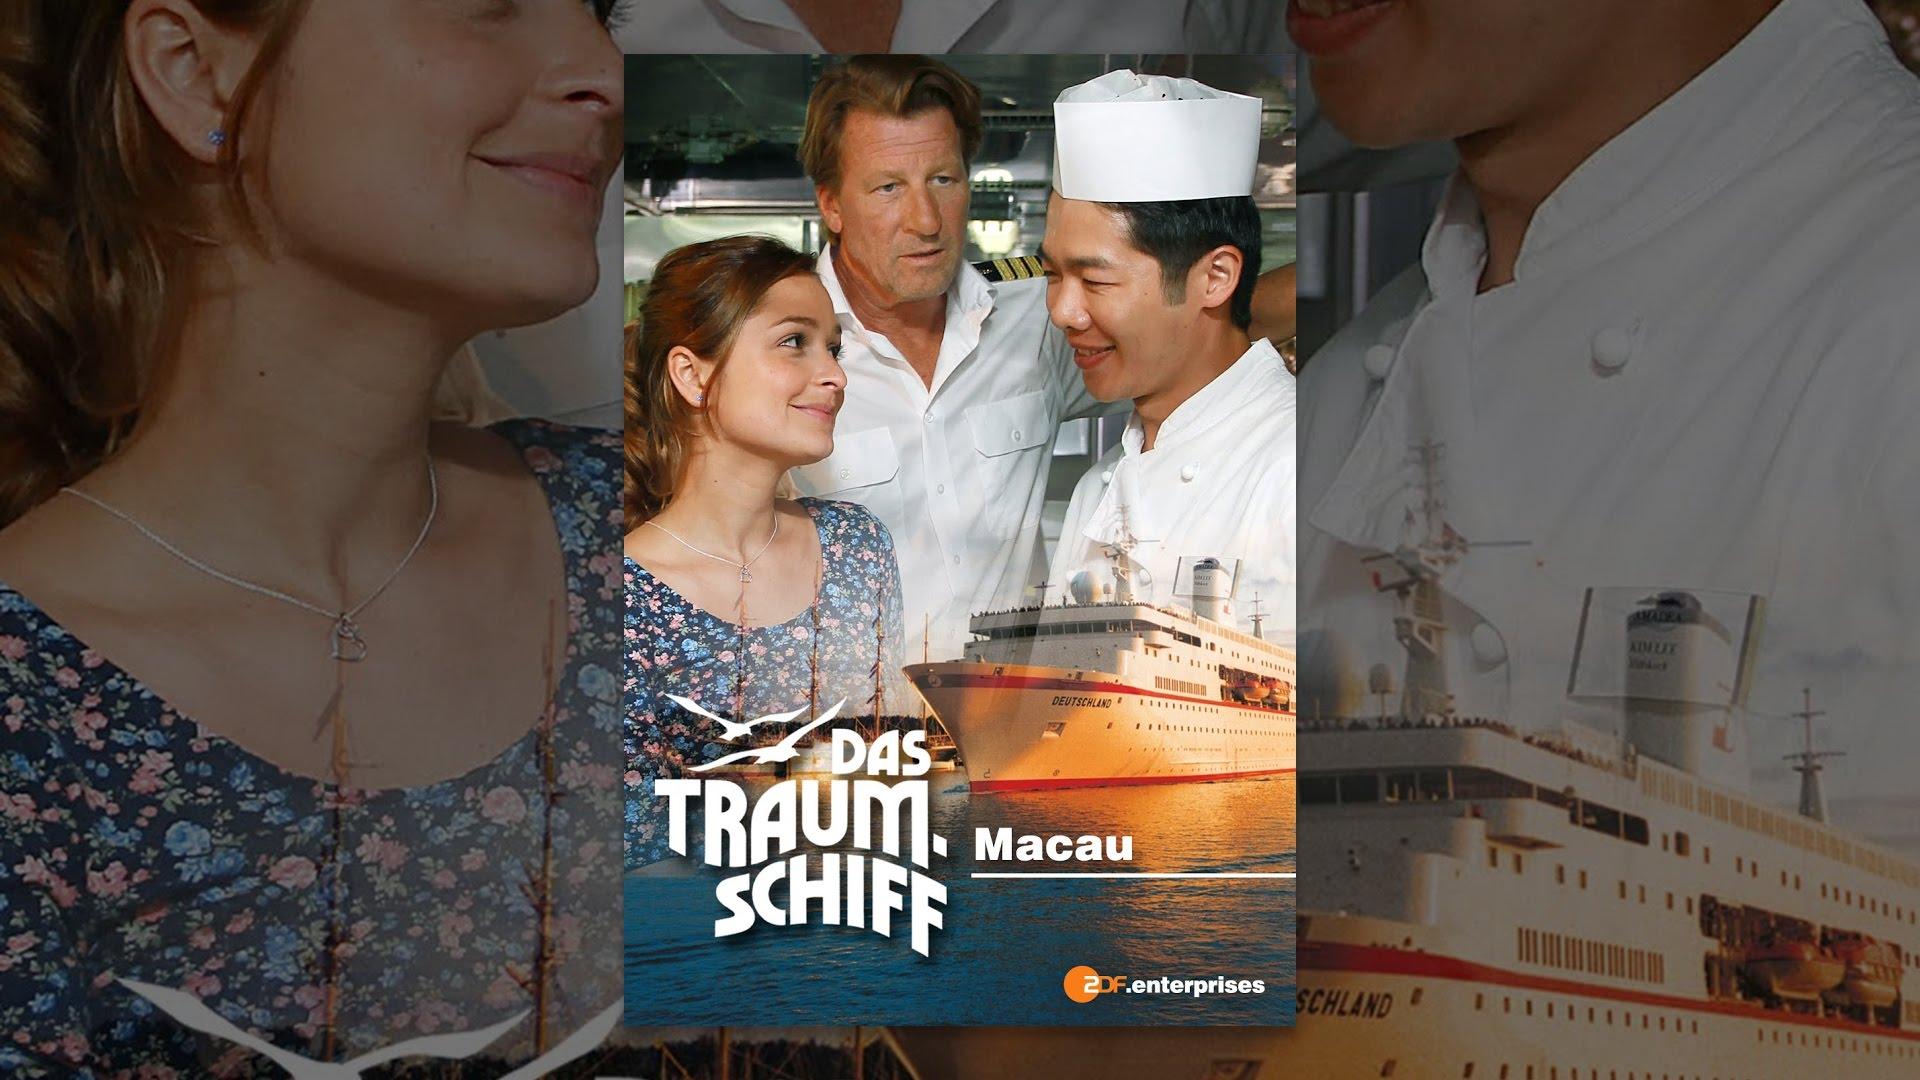 Das Traumschiff Macau